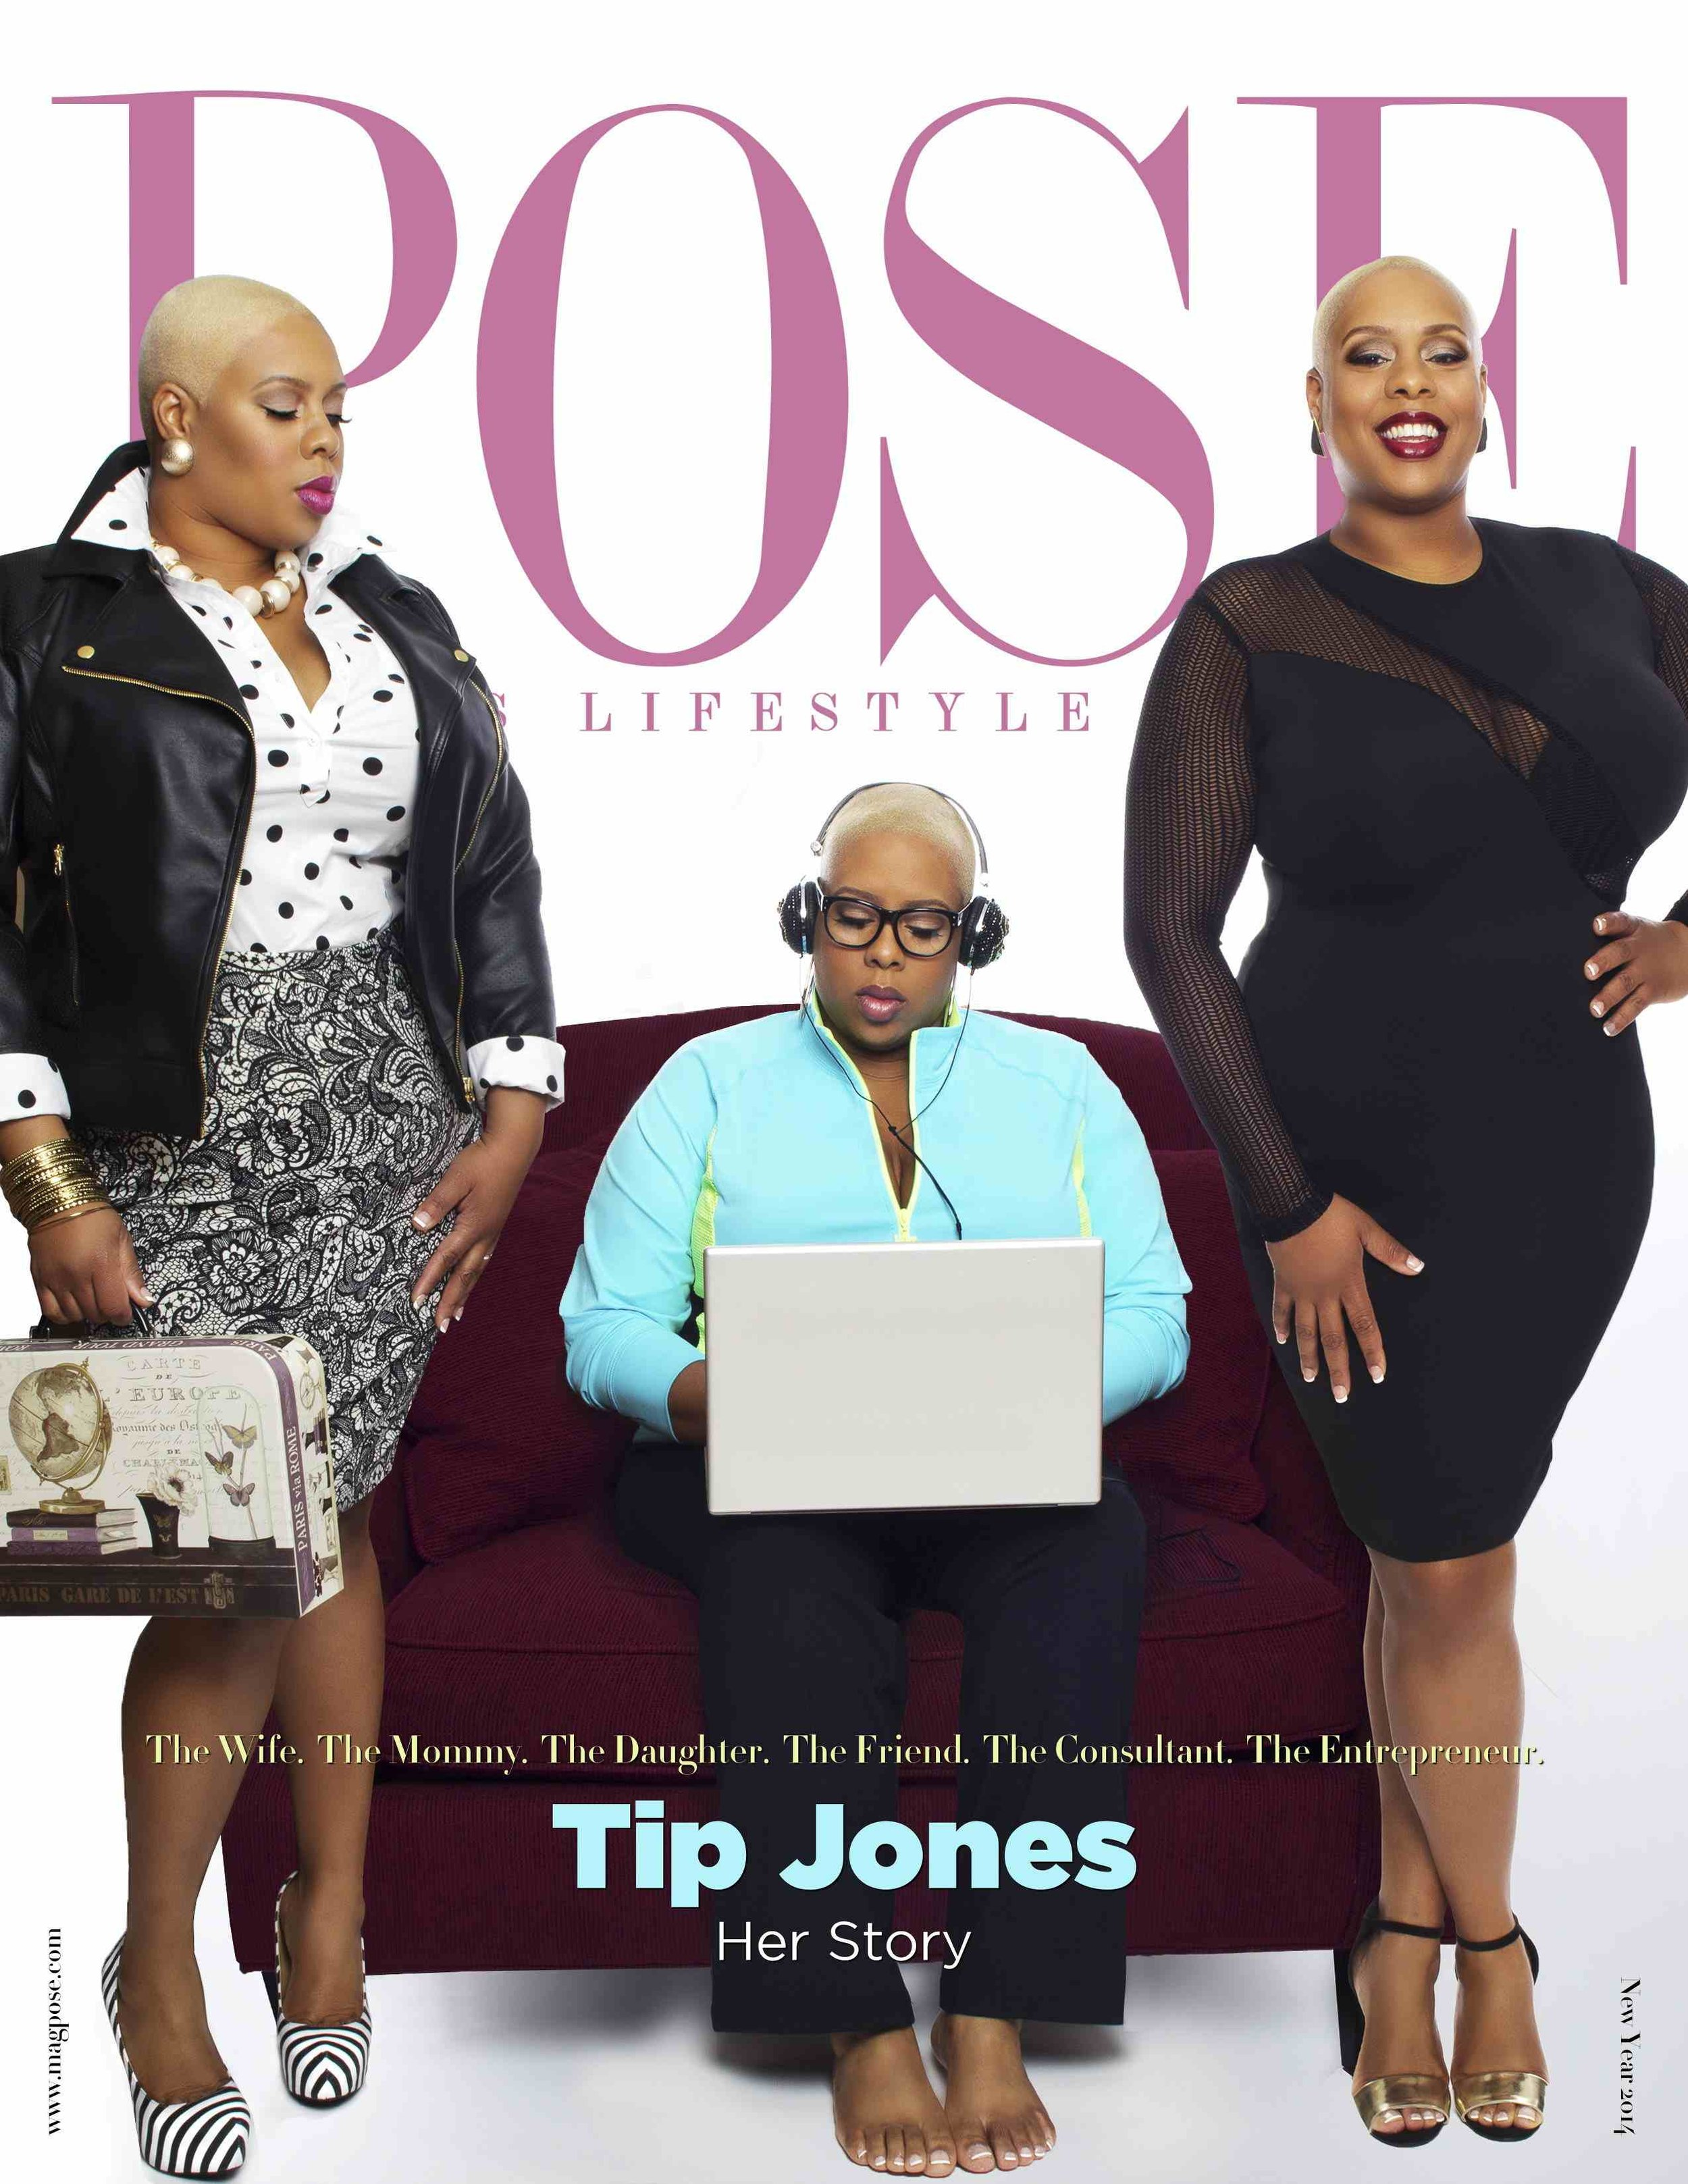 Tip Jones in POSE Magazine